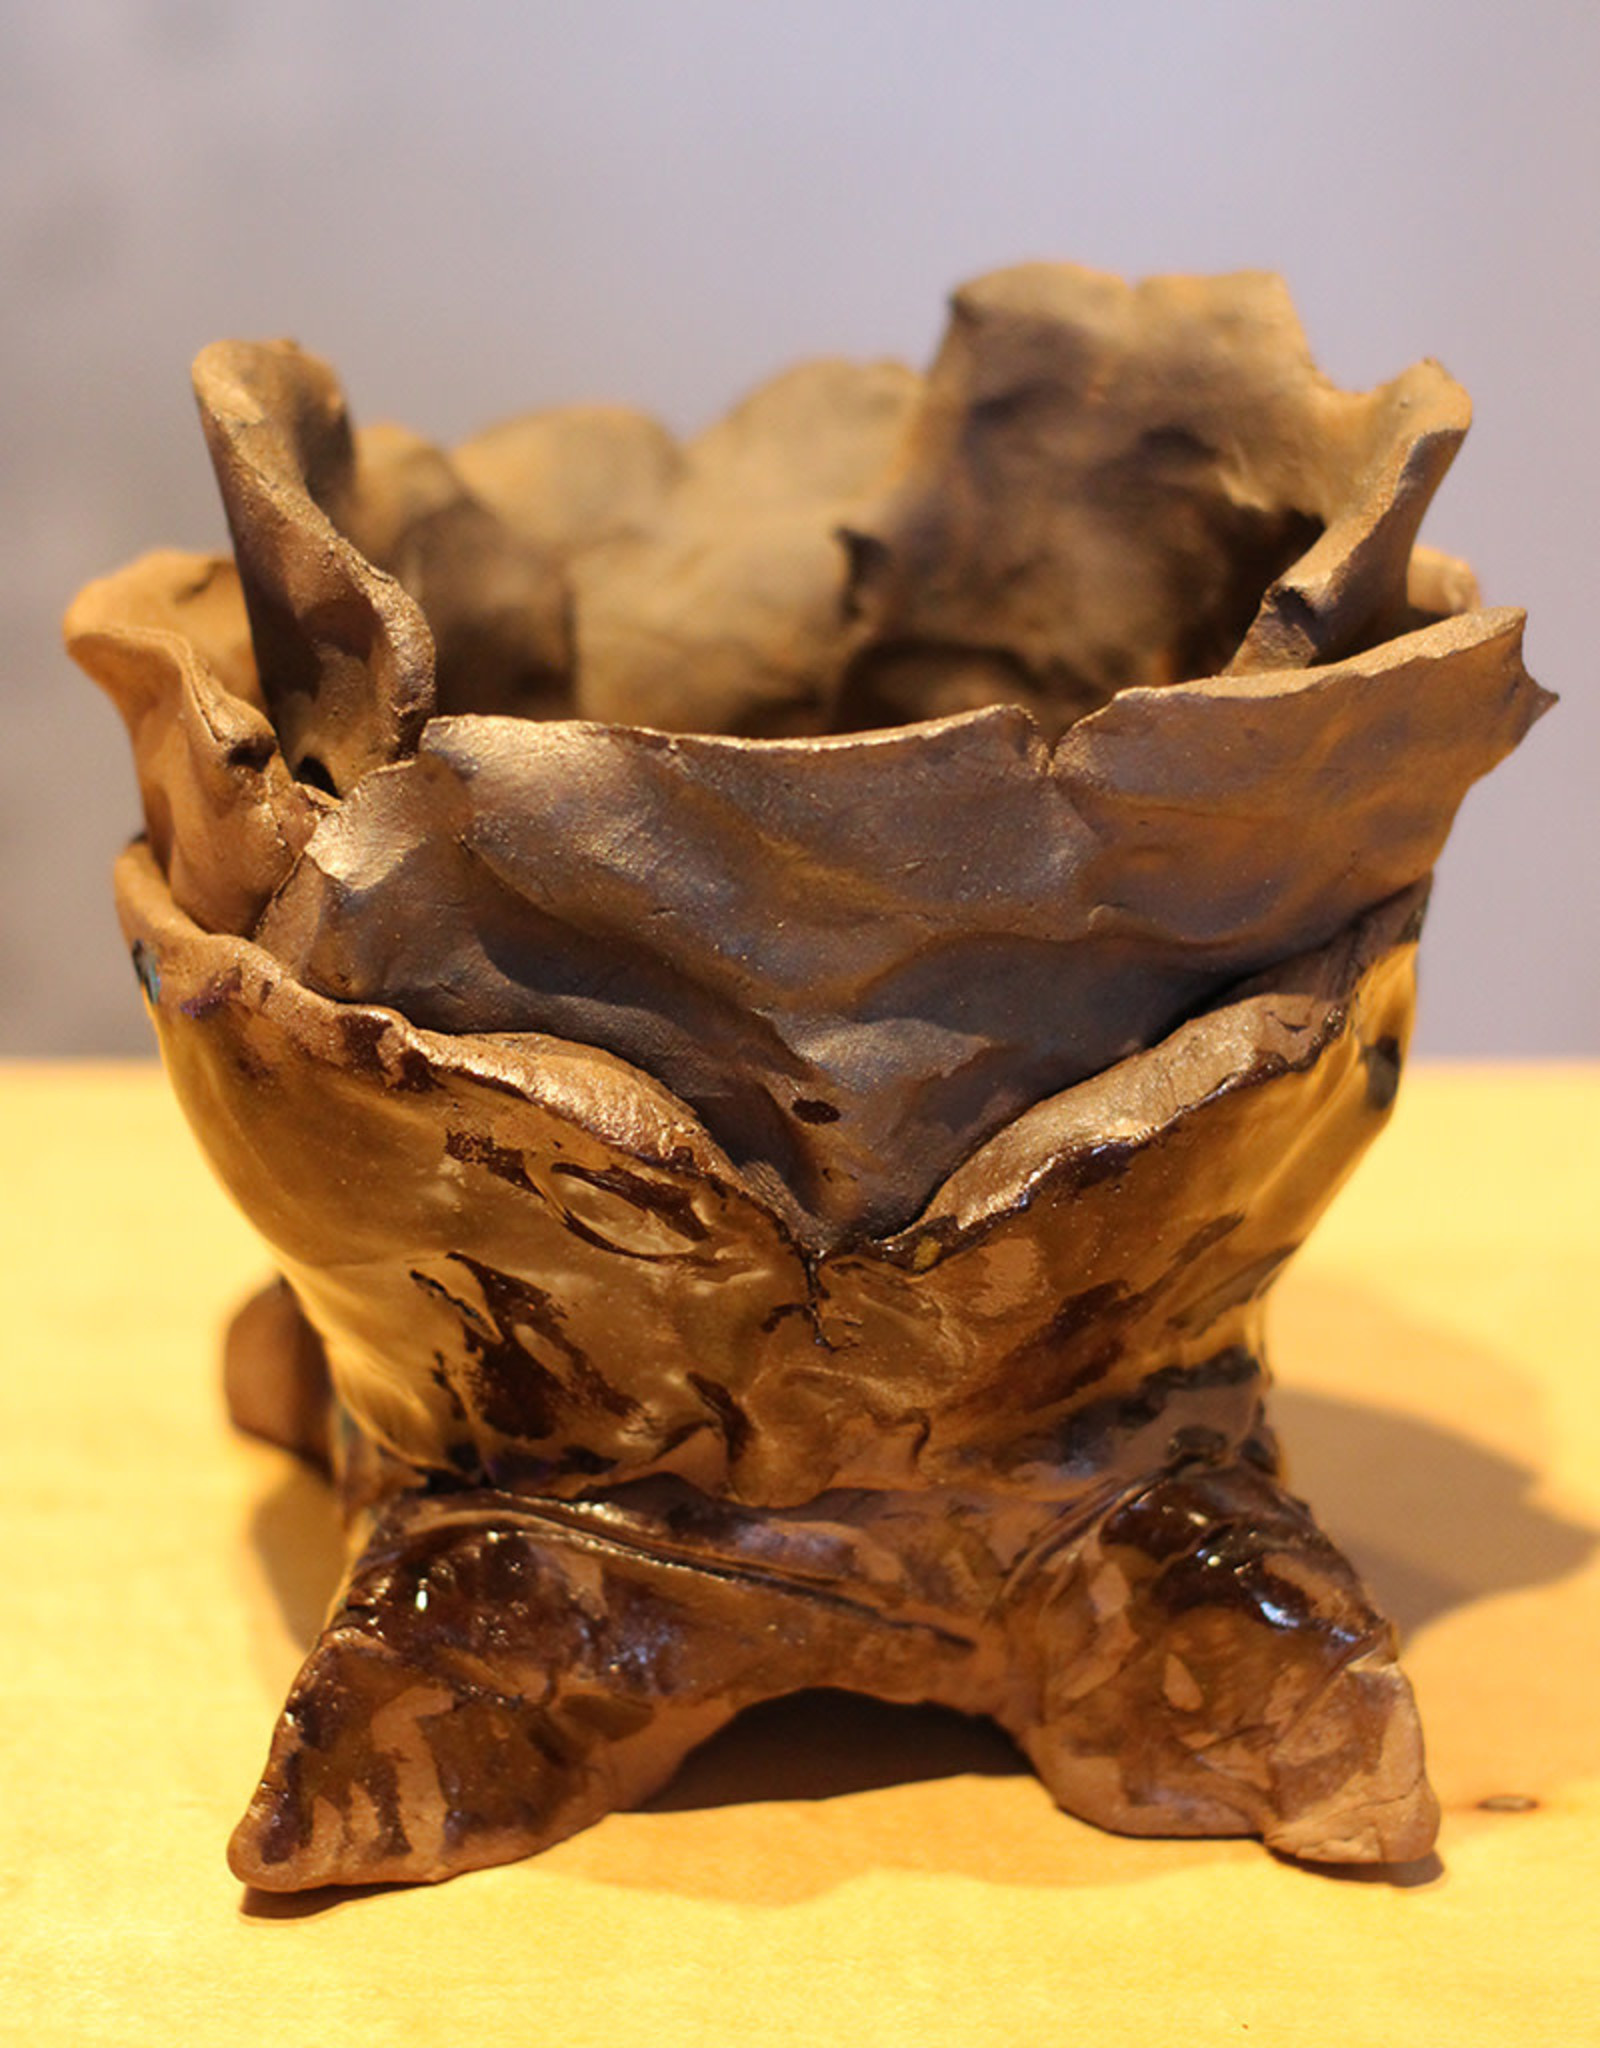 Pandora Patterson Rotted Flower Pot